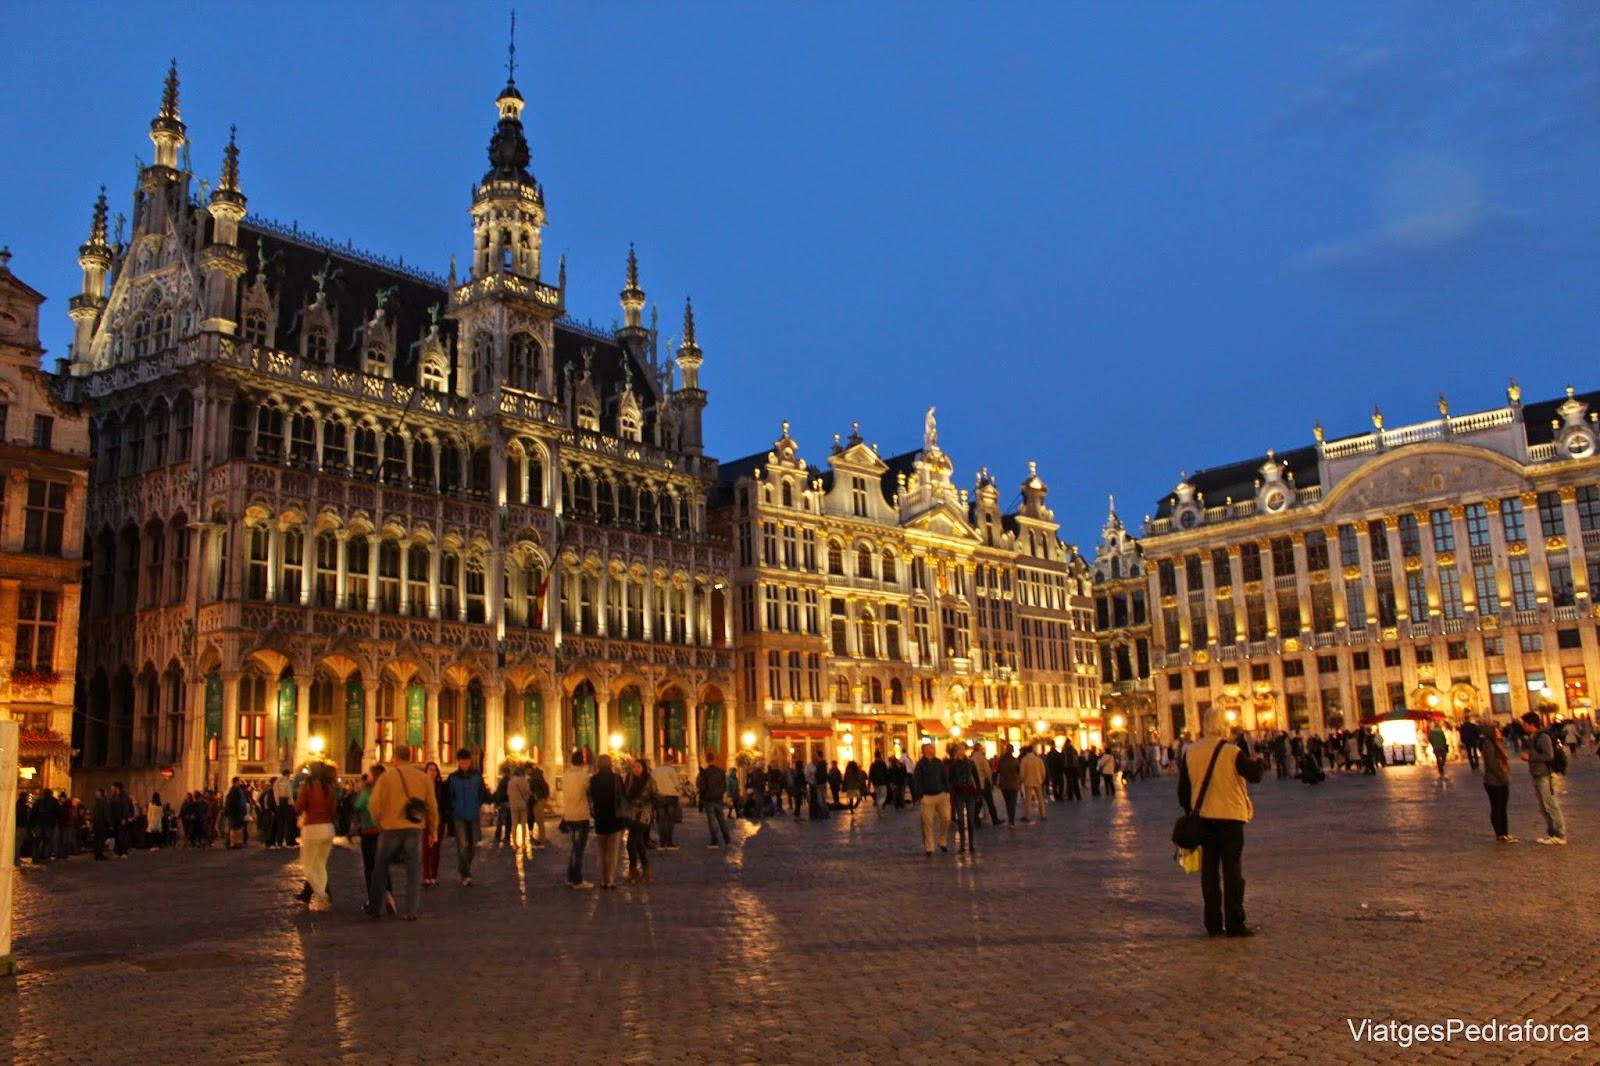 Grand Place de Brussel.les nocturna Belgica